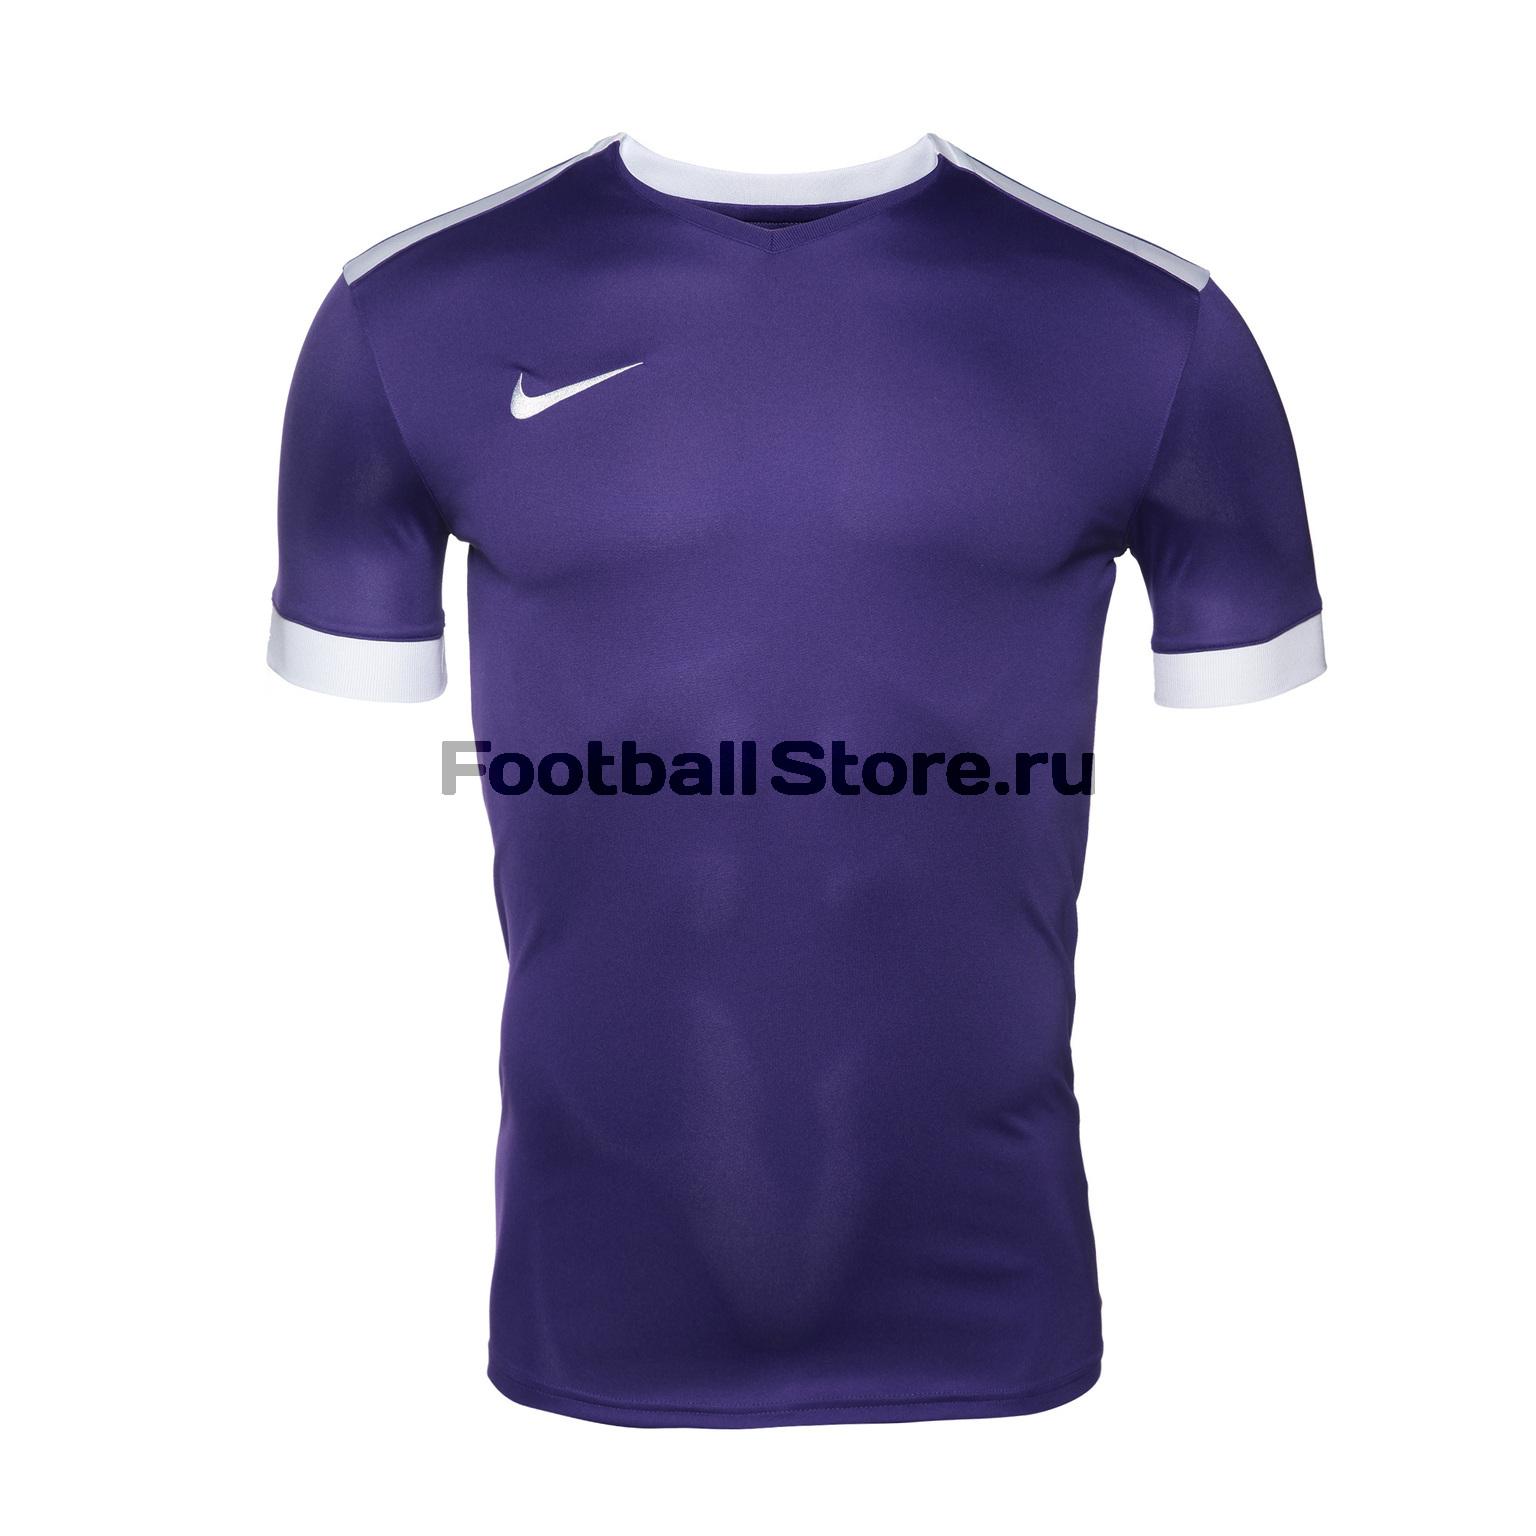 Футболка игровая Nike Park Derby II JSY SS 894312-547 футболка игровая nike ls park derby jsy 588414 106